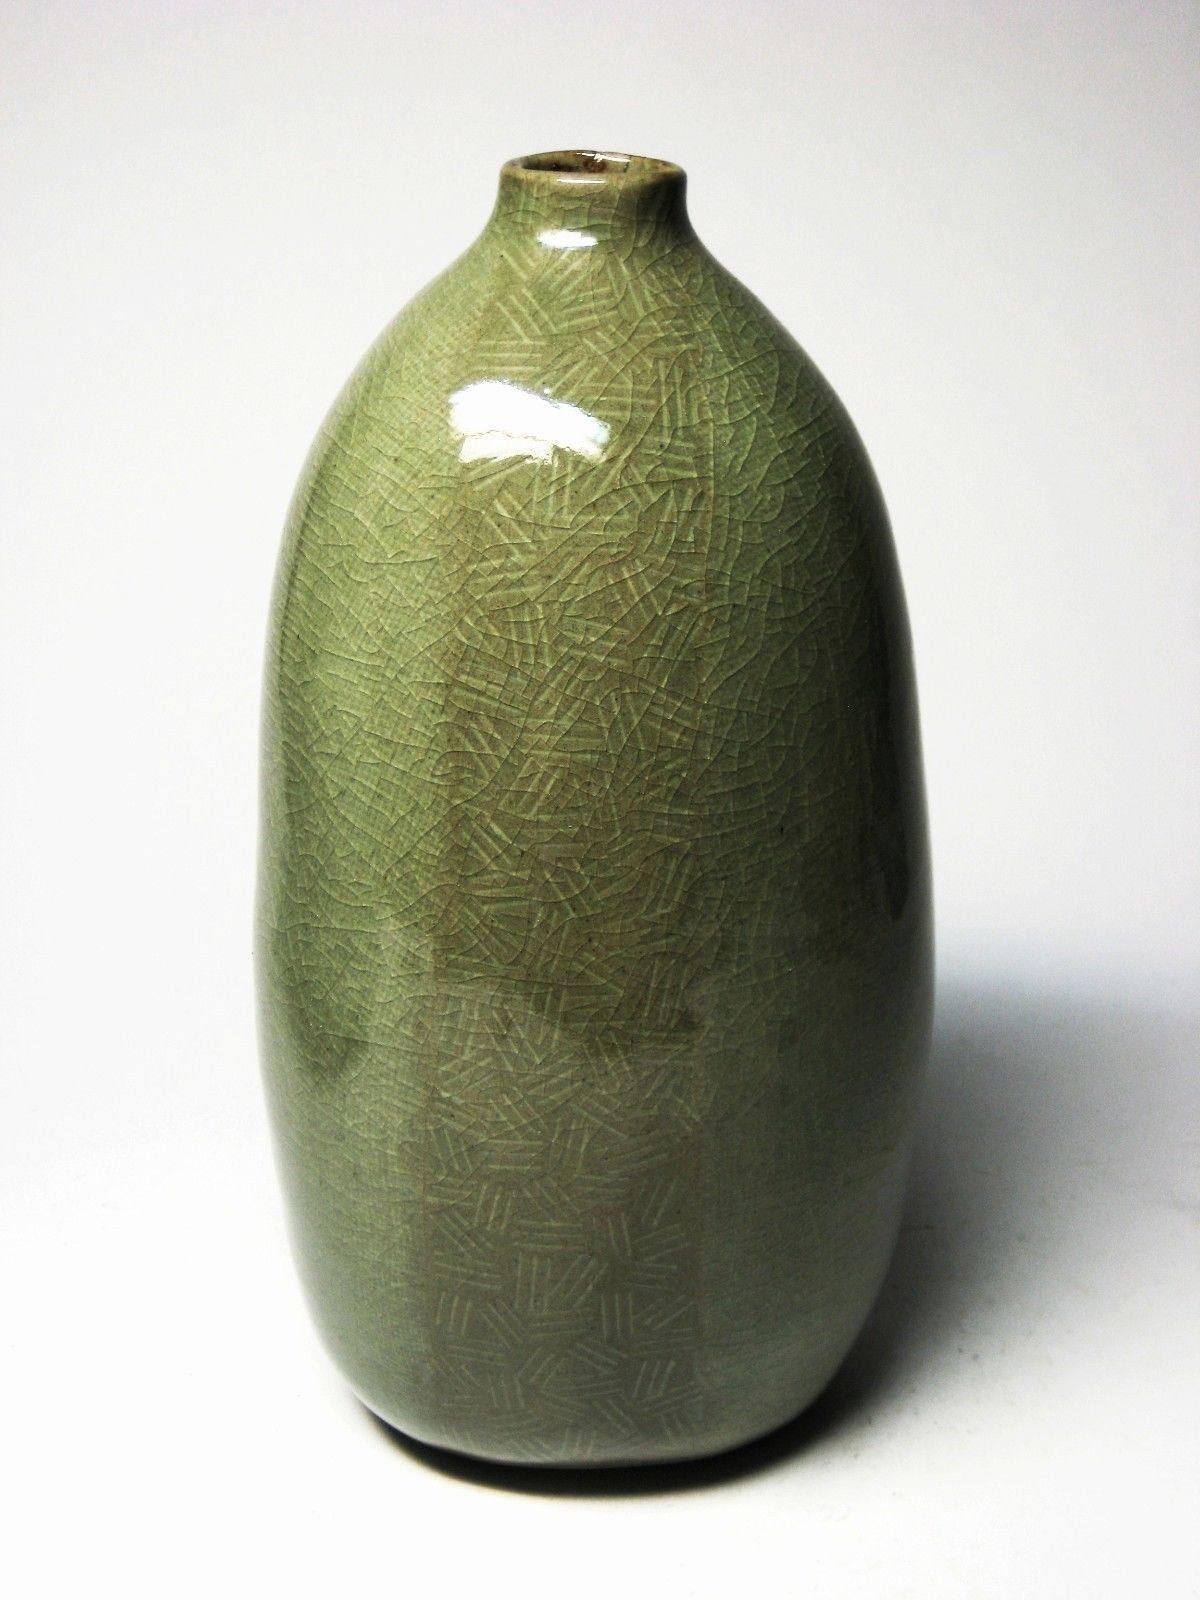 korean celadon pottery jade green crackle glaze bottle modern vase  - korean celadon pottery jade green crackle glaze bottle modern vase weed pot ebay